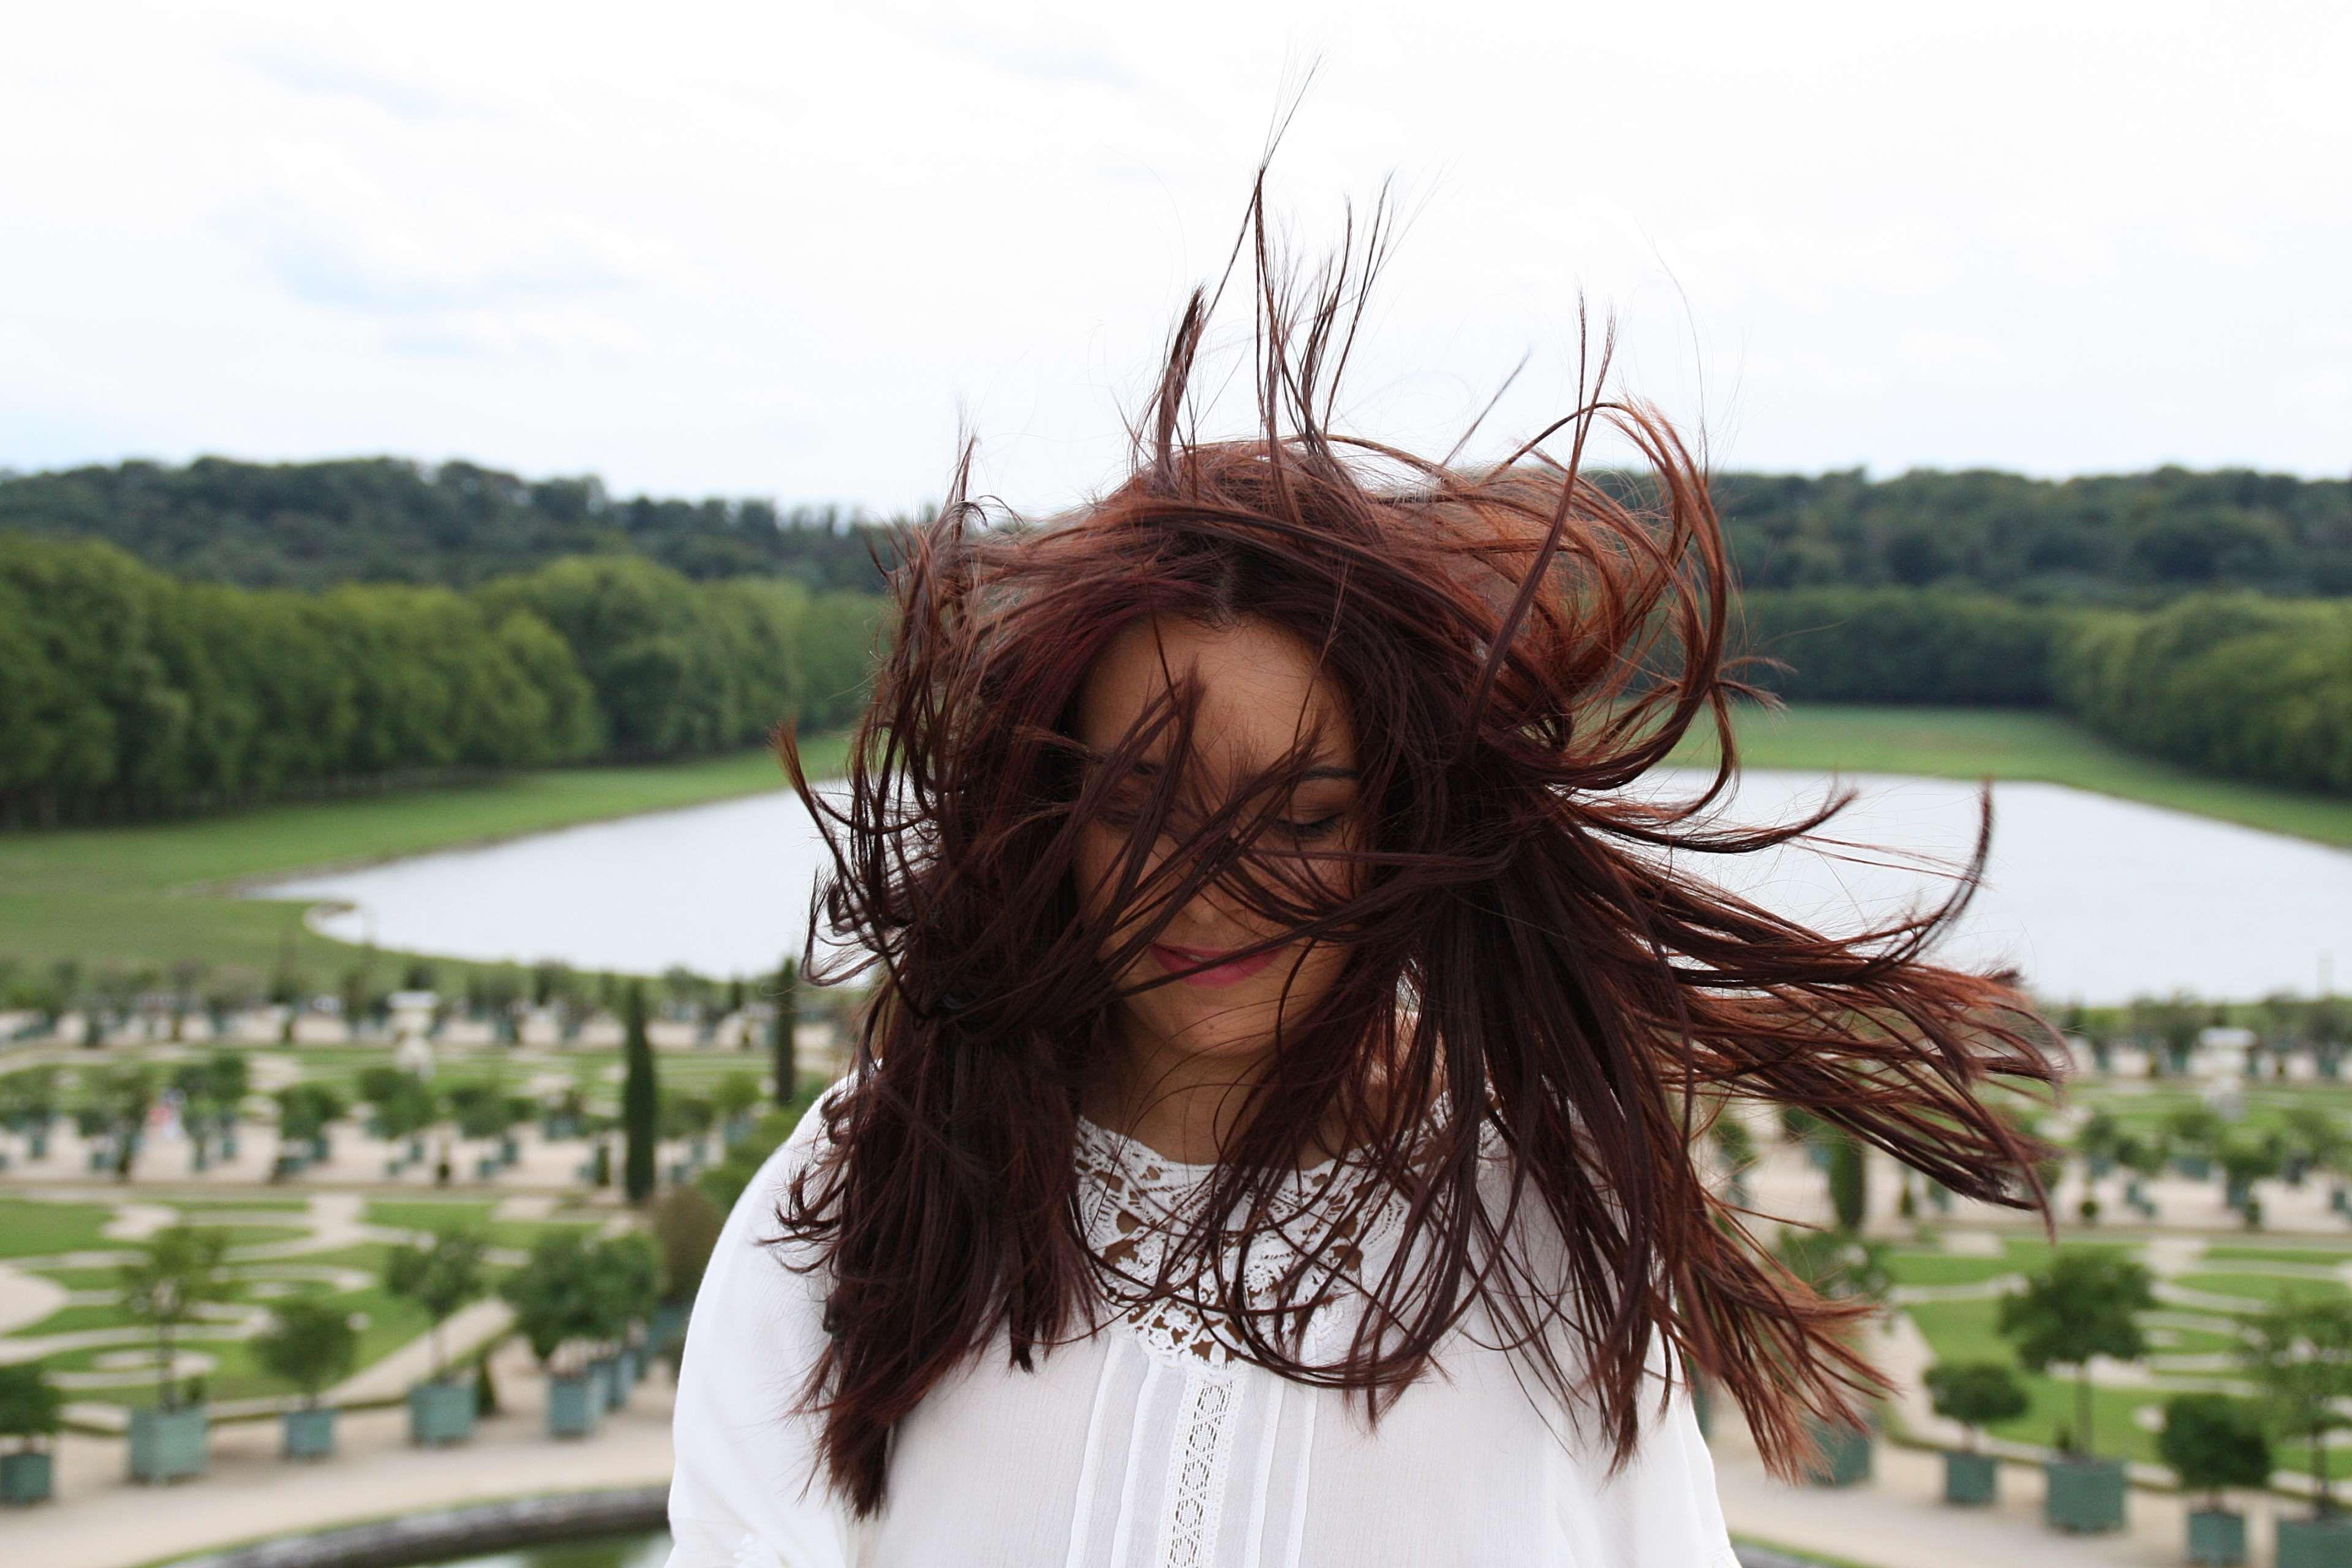 #aire #gente #hair #retrato